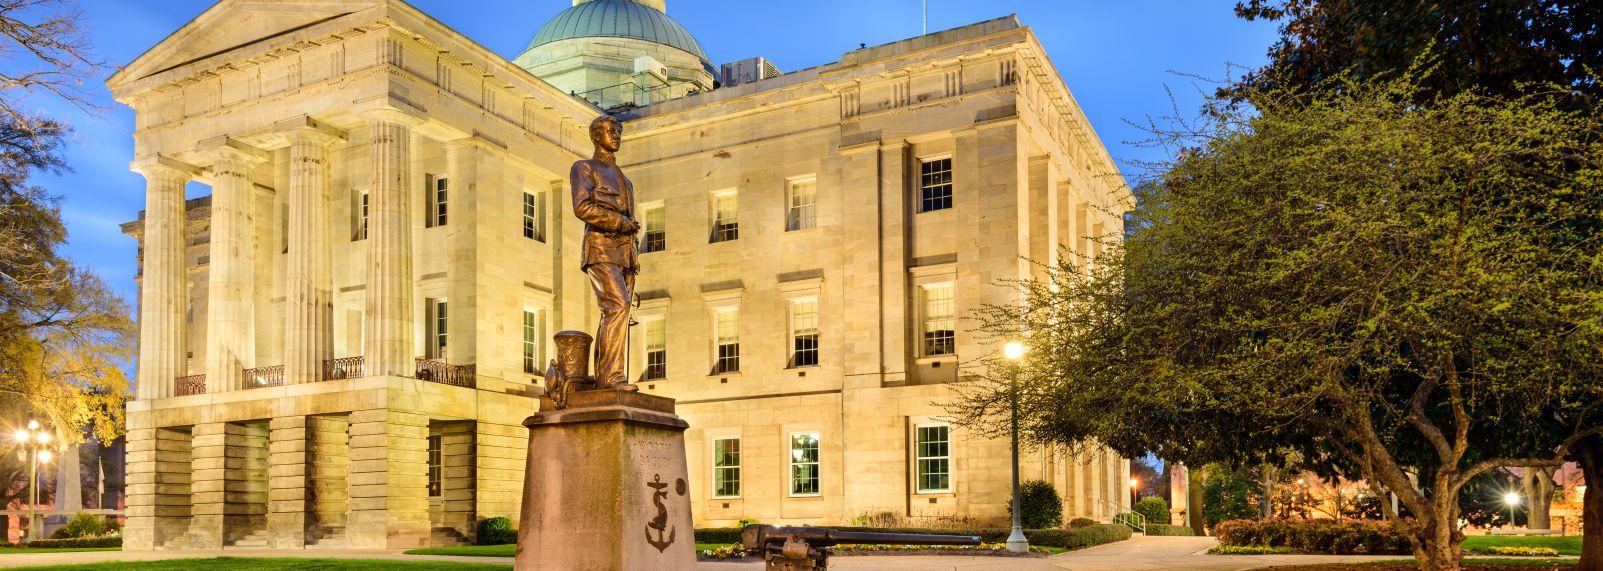 N.C. State Capitol